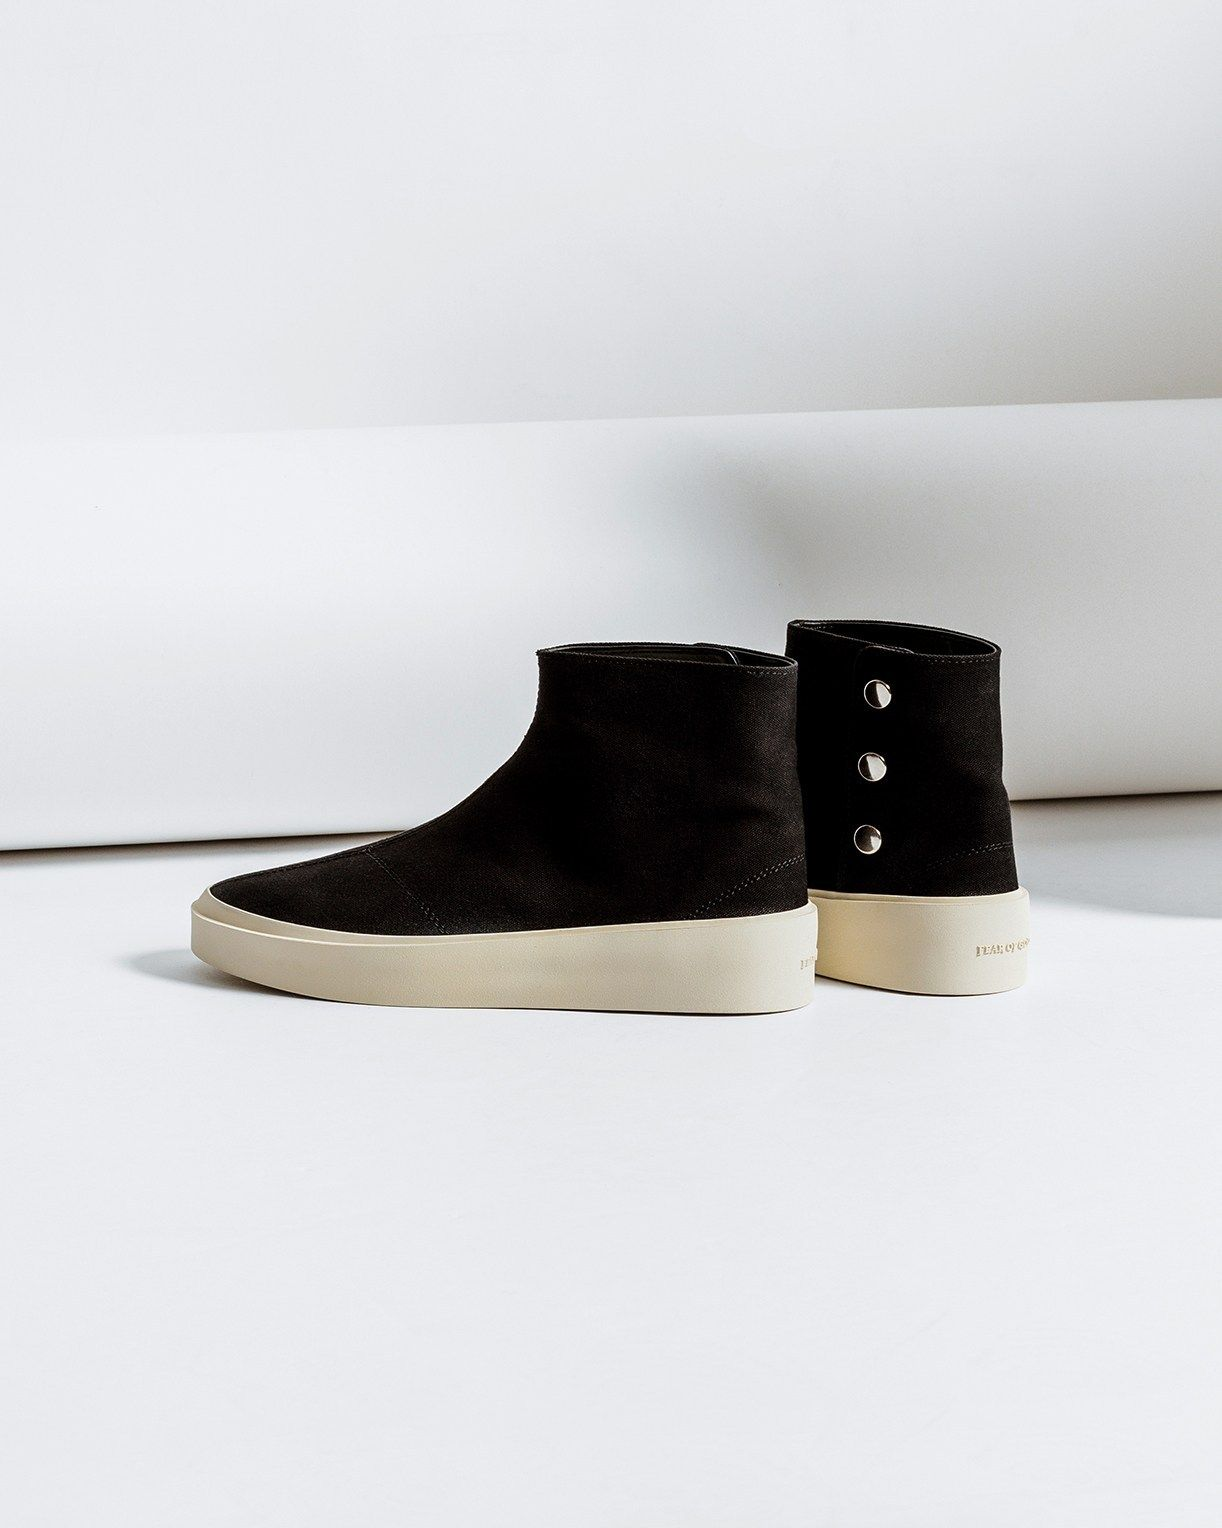 Tear-Away Moc Sneaker Takes Design Cues